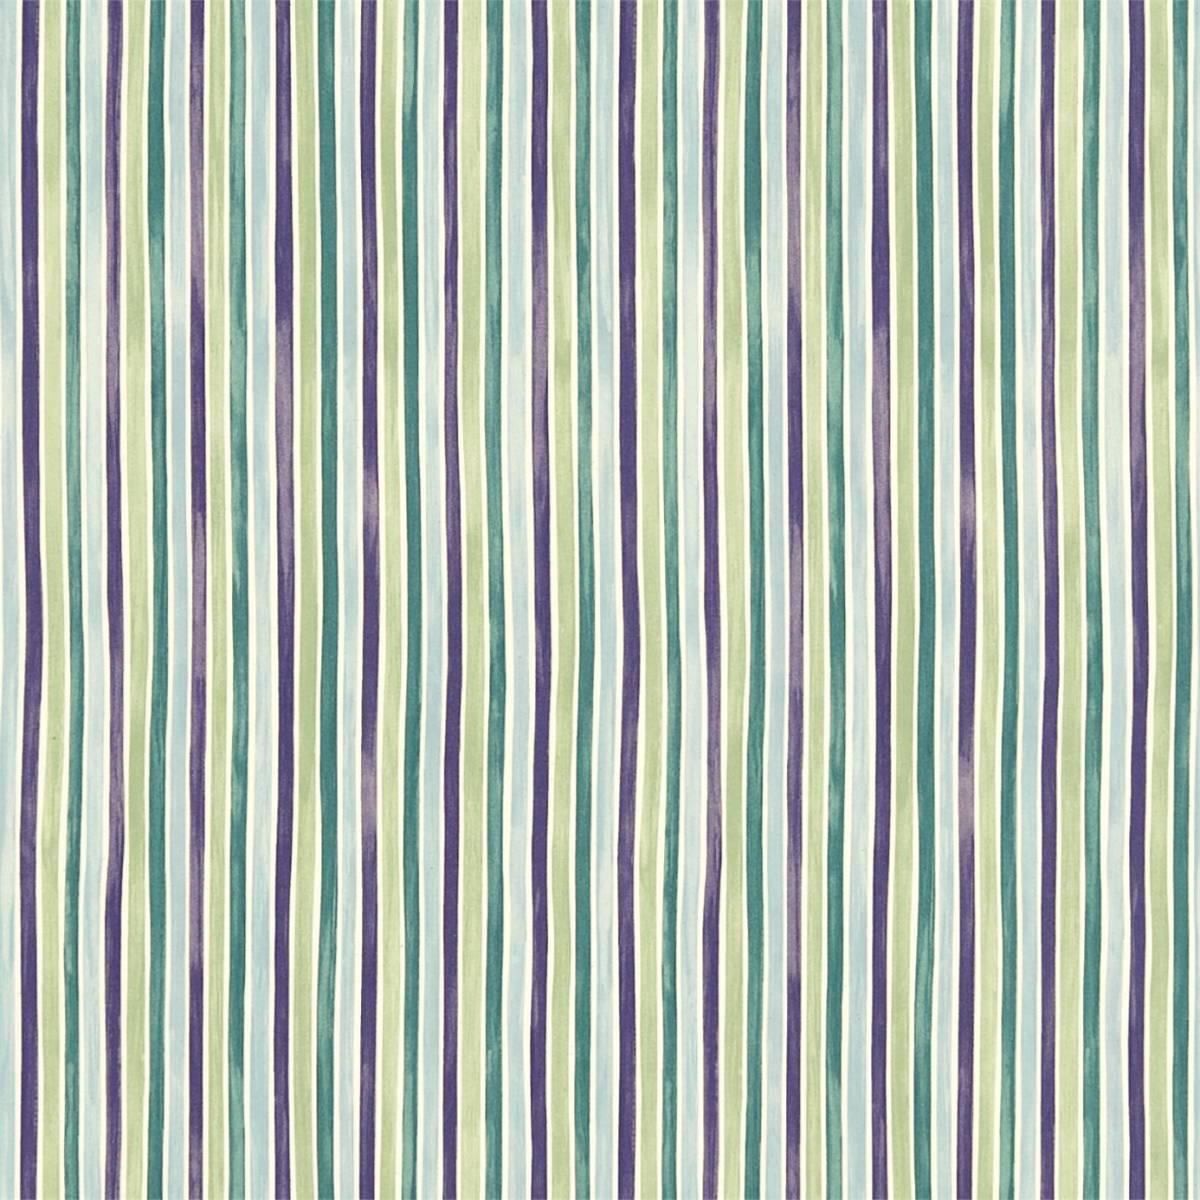 Roman Blinds In Polka Stripe Fabric Purple Green 223449